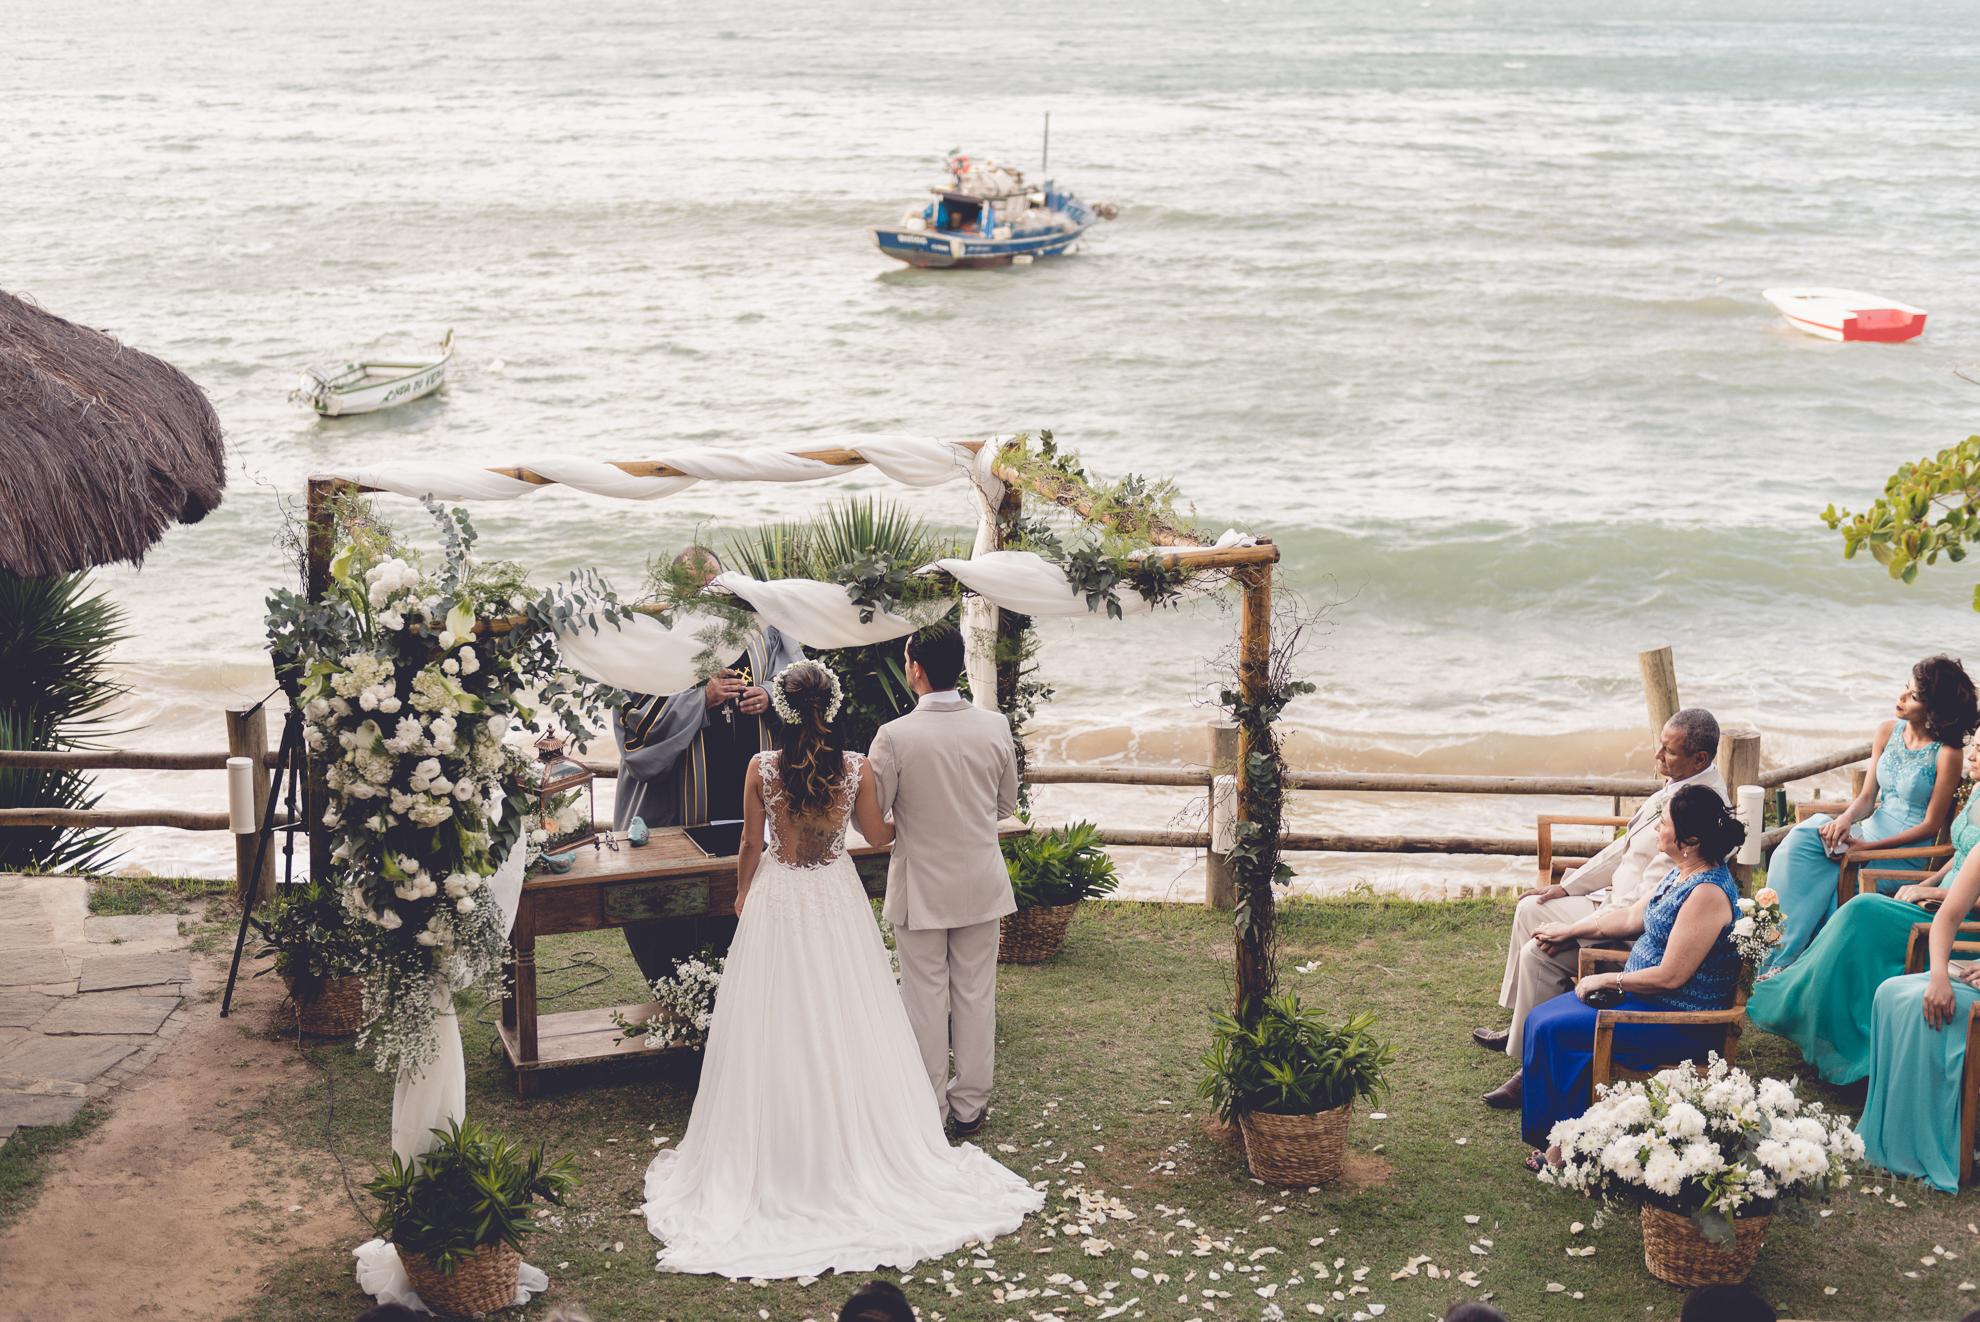 Pousada Praia da Tartaruga - Priscila & Guilherme (48)